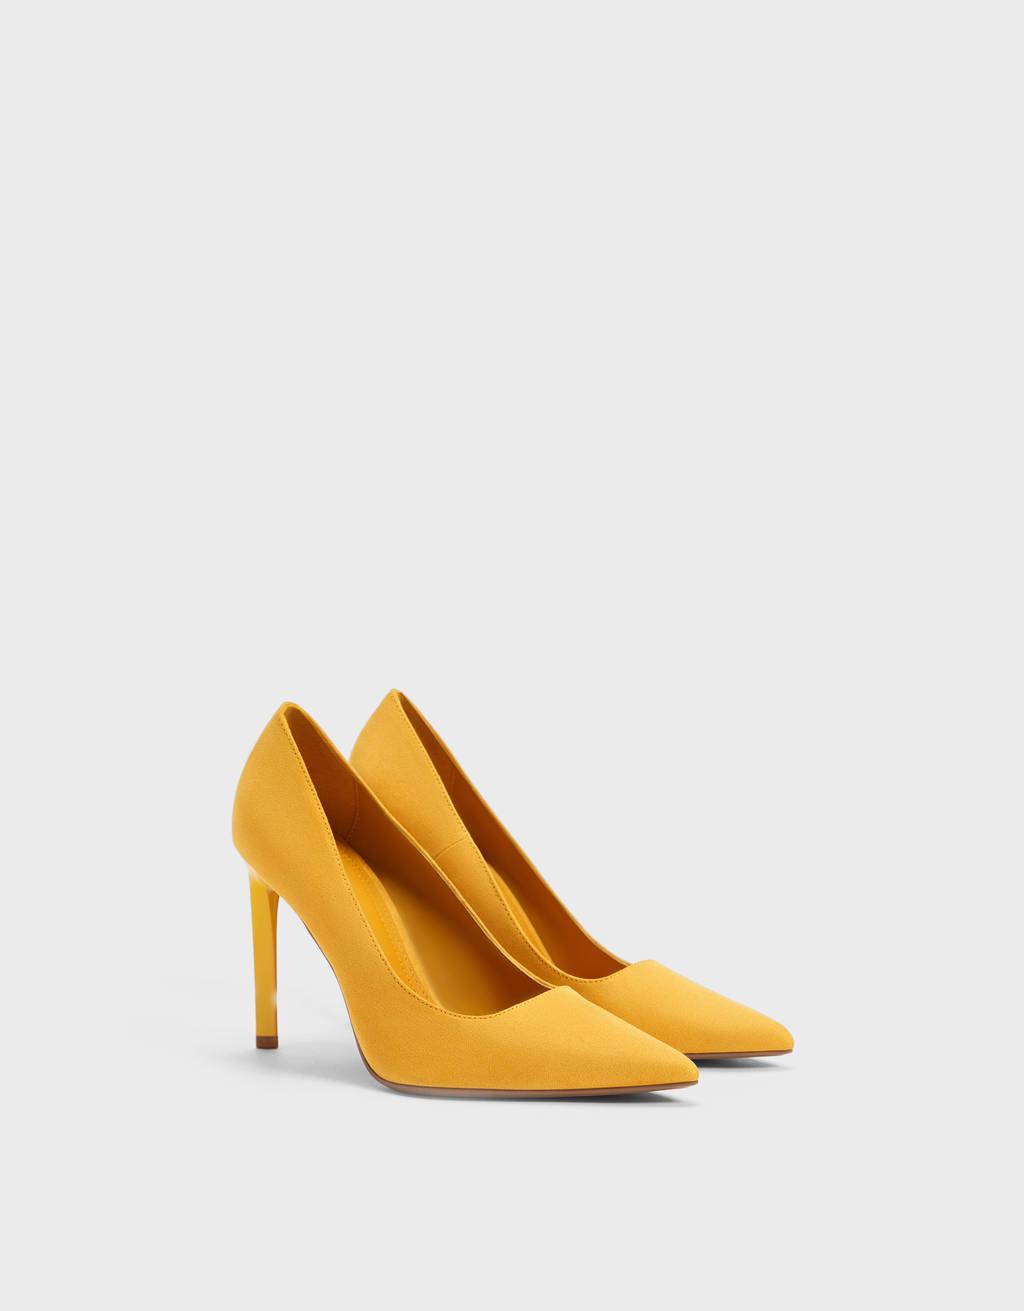 33ad8e7c50b Zapatos de mujer - Otoño 2019   Bershka